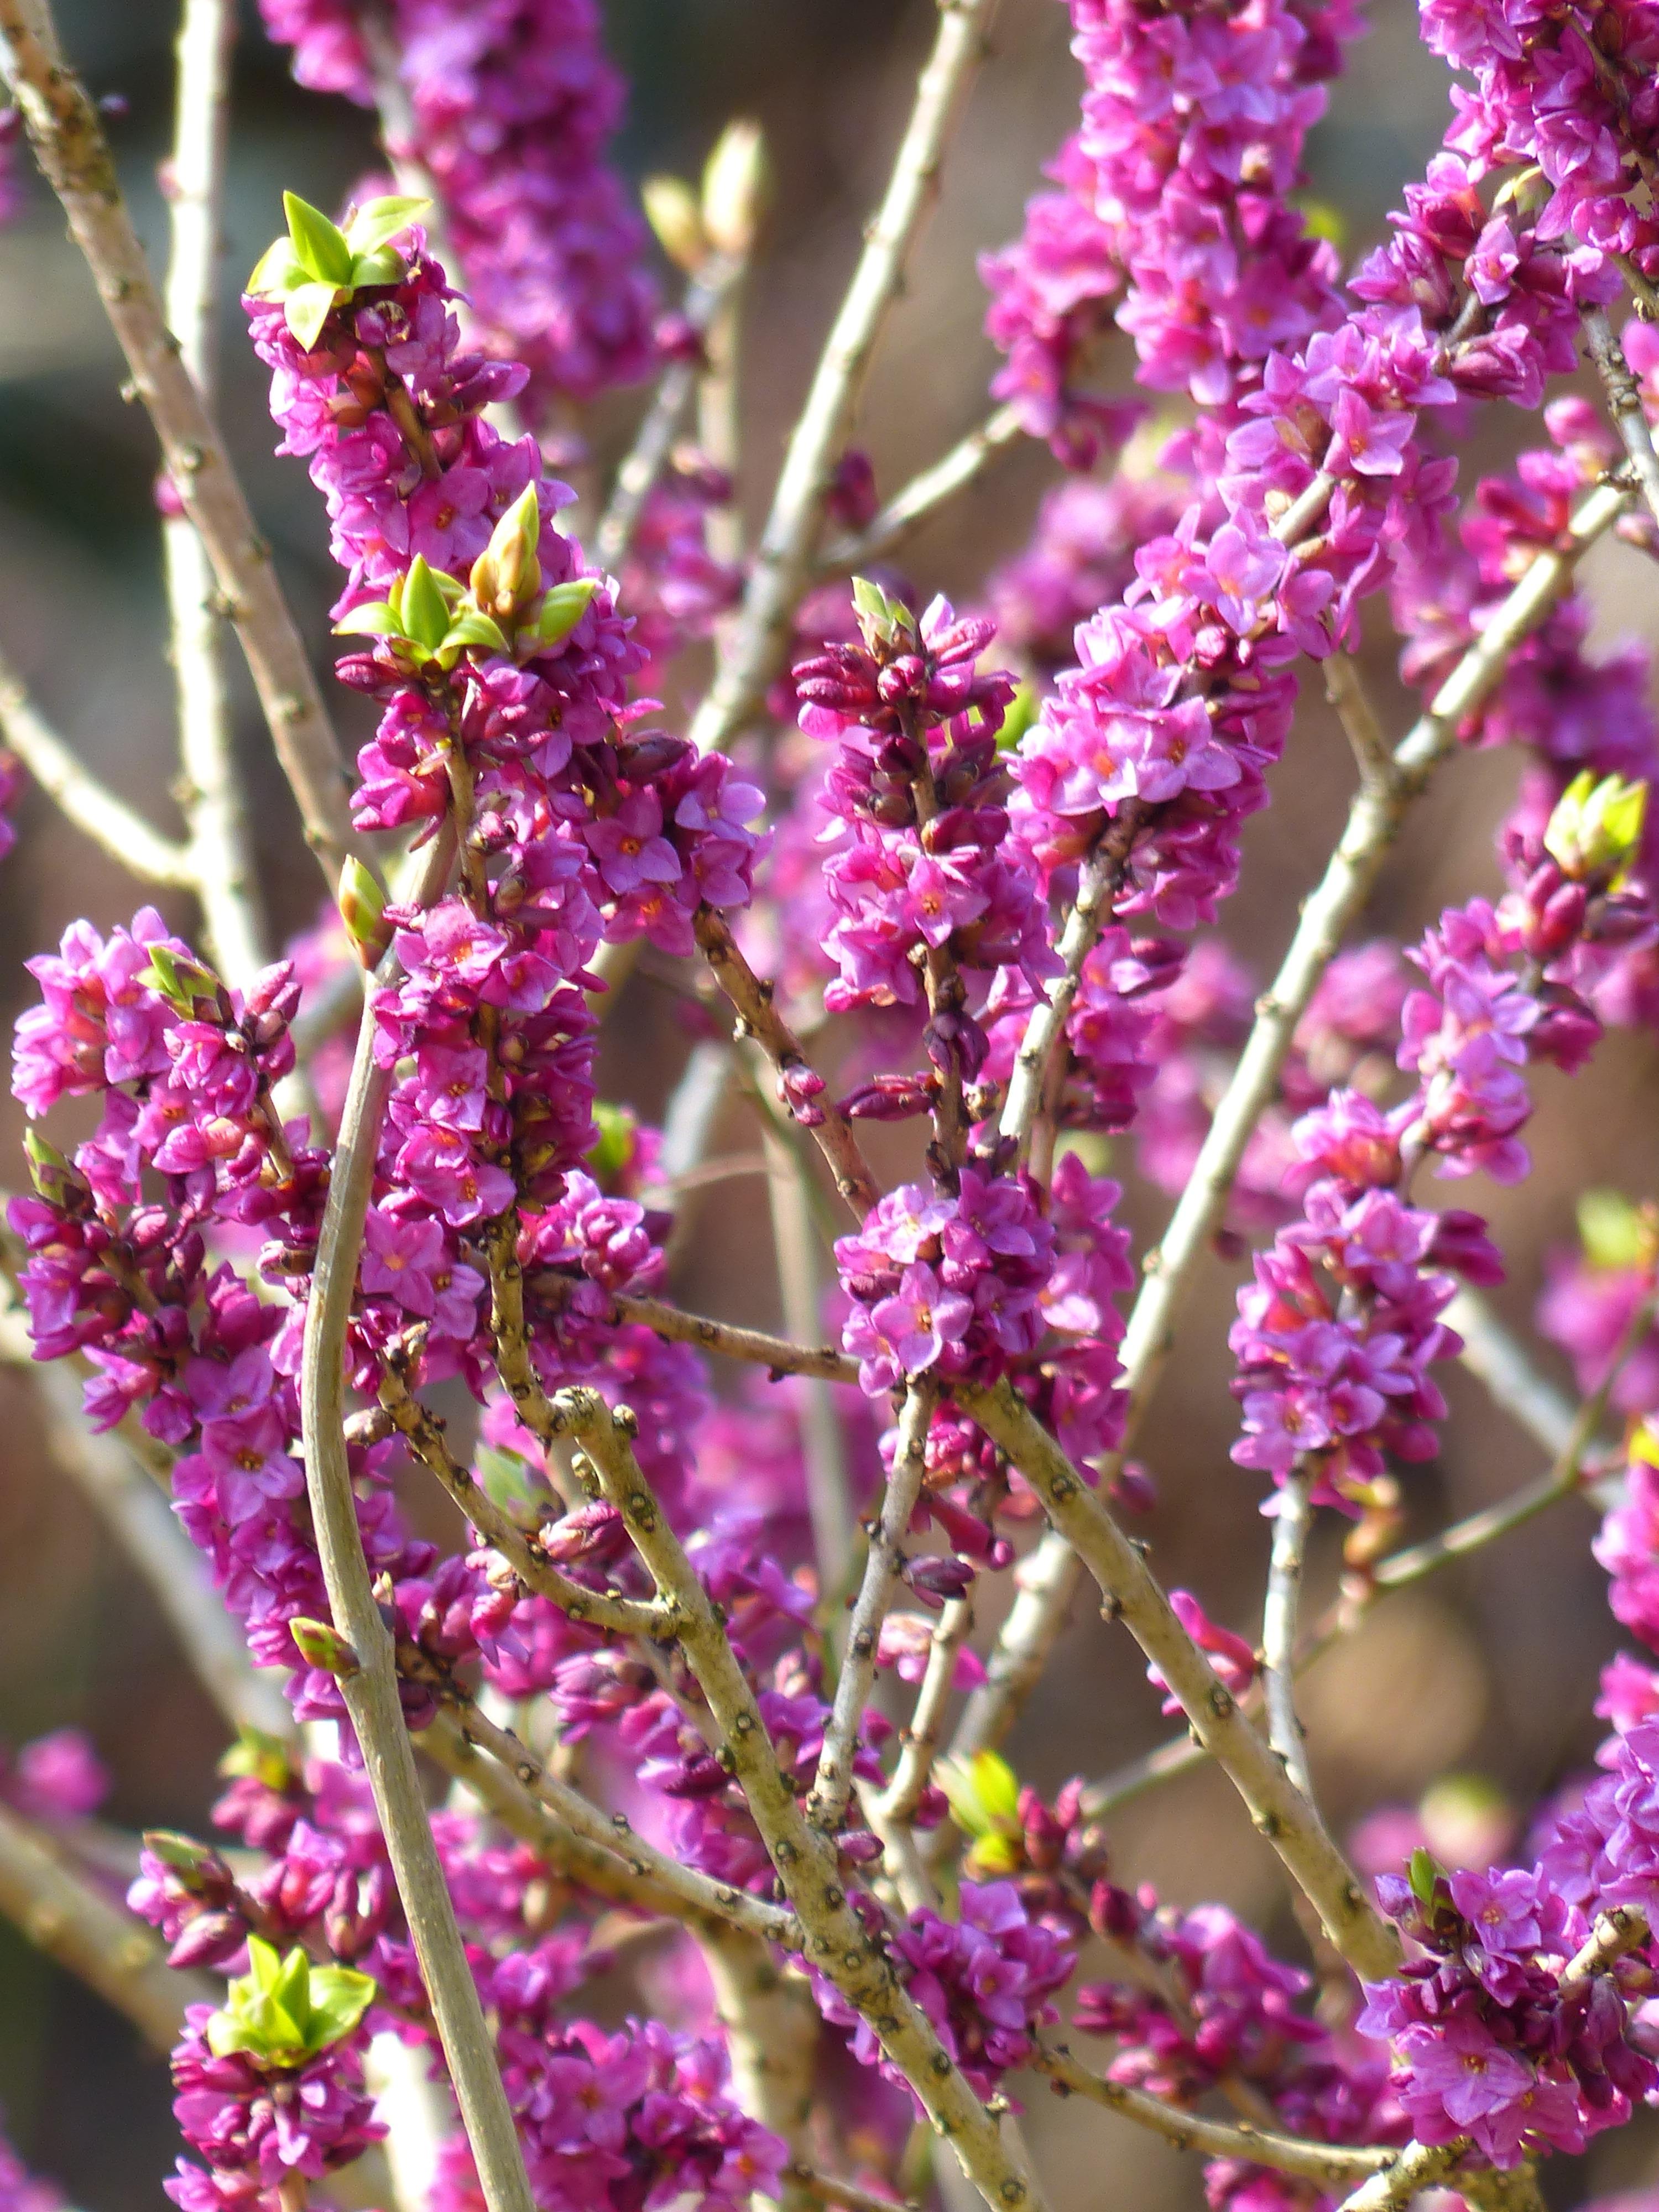 banco de imagens natureza ramo flor plantar folha flor roxa primavera erva produzir botnica jardim flora flores silvestres arbusto tolet